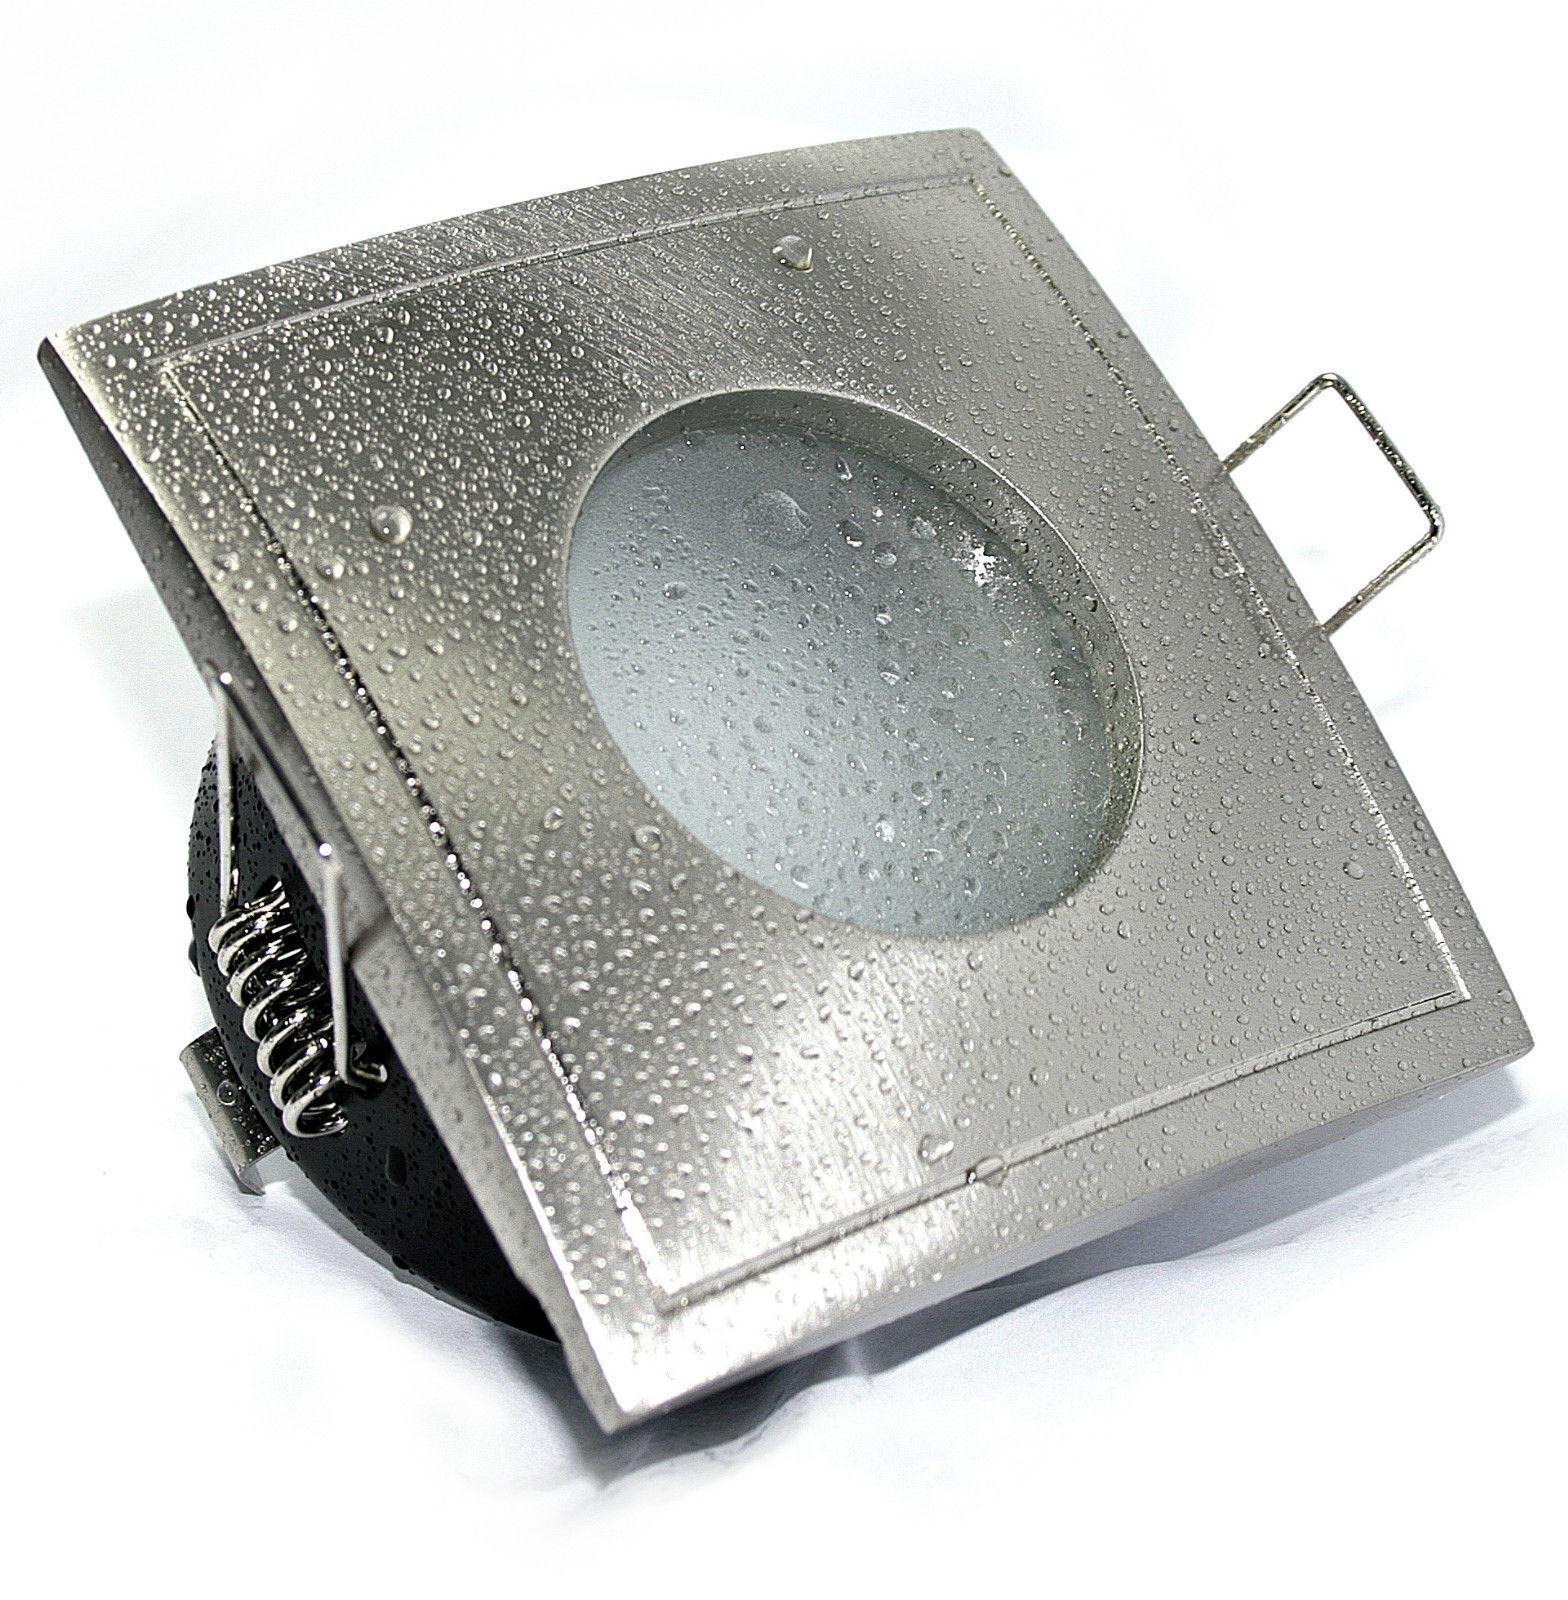 12V Einbaustrahler BAD Spot IP65 AQUA SQUARE MR16 & 5W Leuchtmittel 5Watt NV